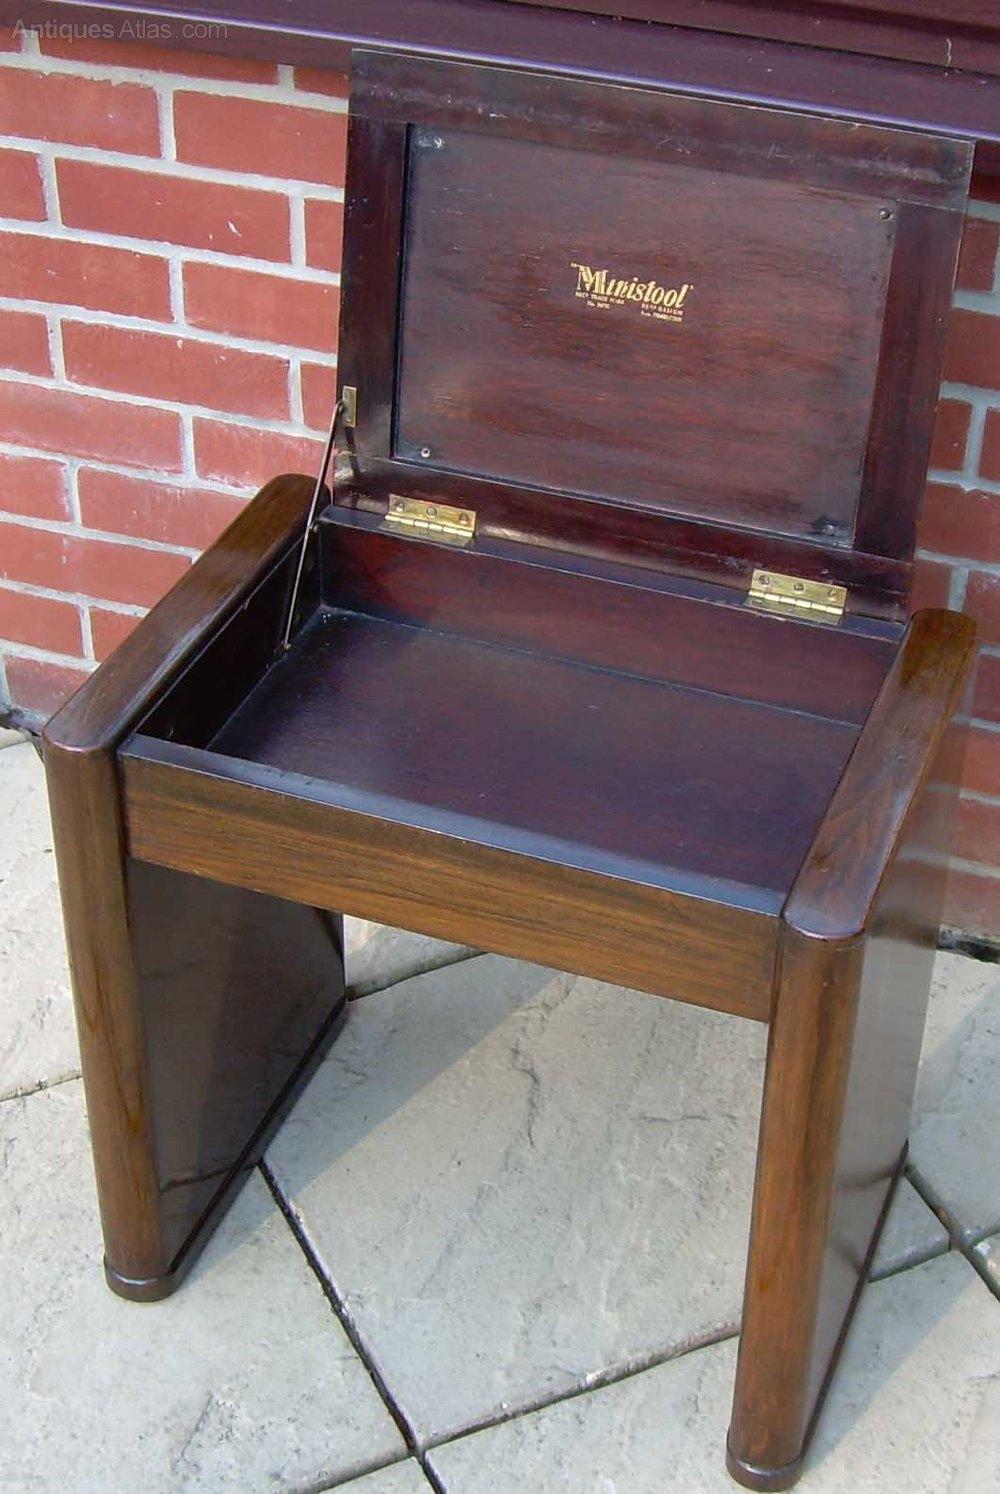 A walnut Art Deco piano stool Antique Piano Stools %%alt5%% ... & A Walnut Art Deco Piano Stool - Antiques Atlas islam-shia.org